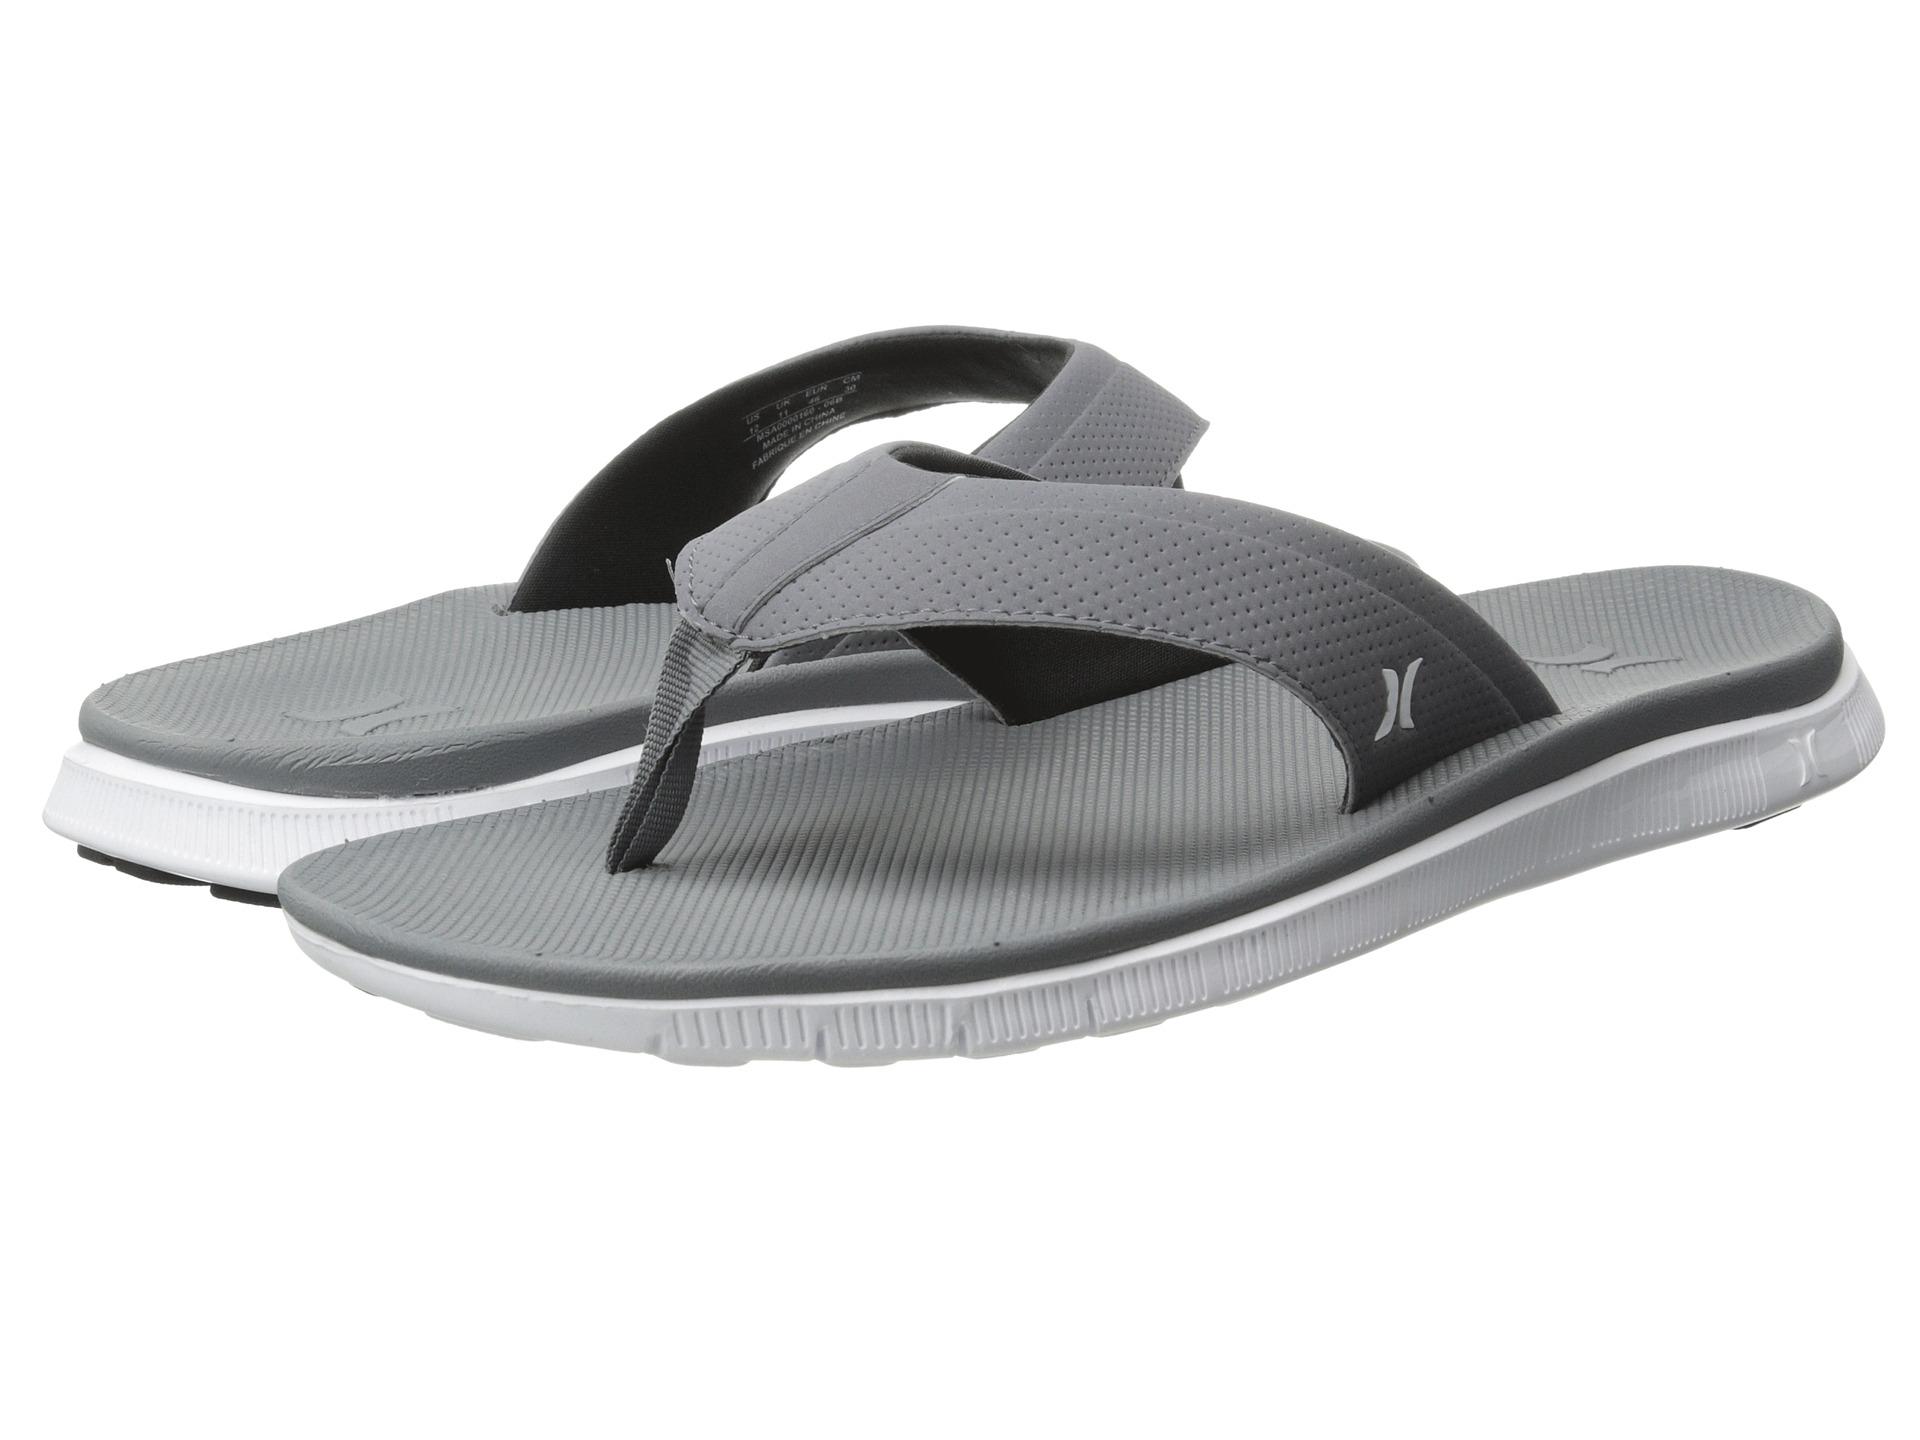 9044bef1d Hurley Flex Sandal in Gray - Lyst